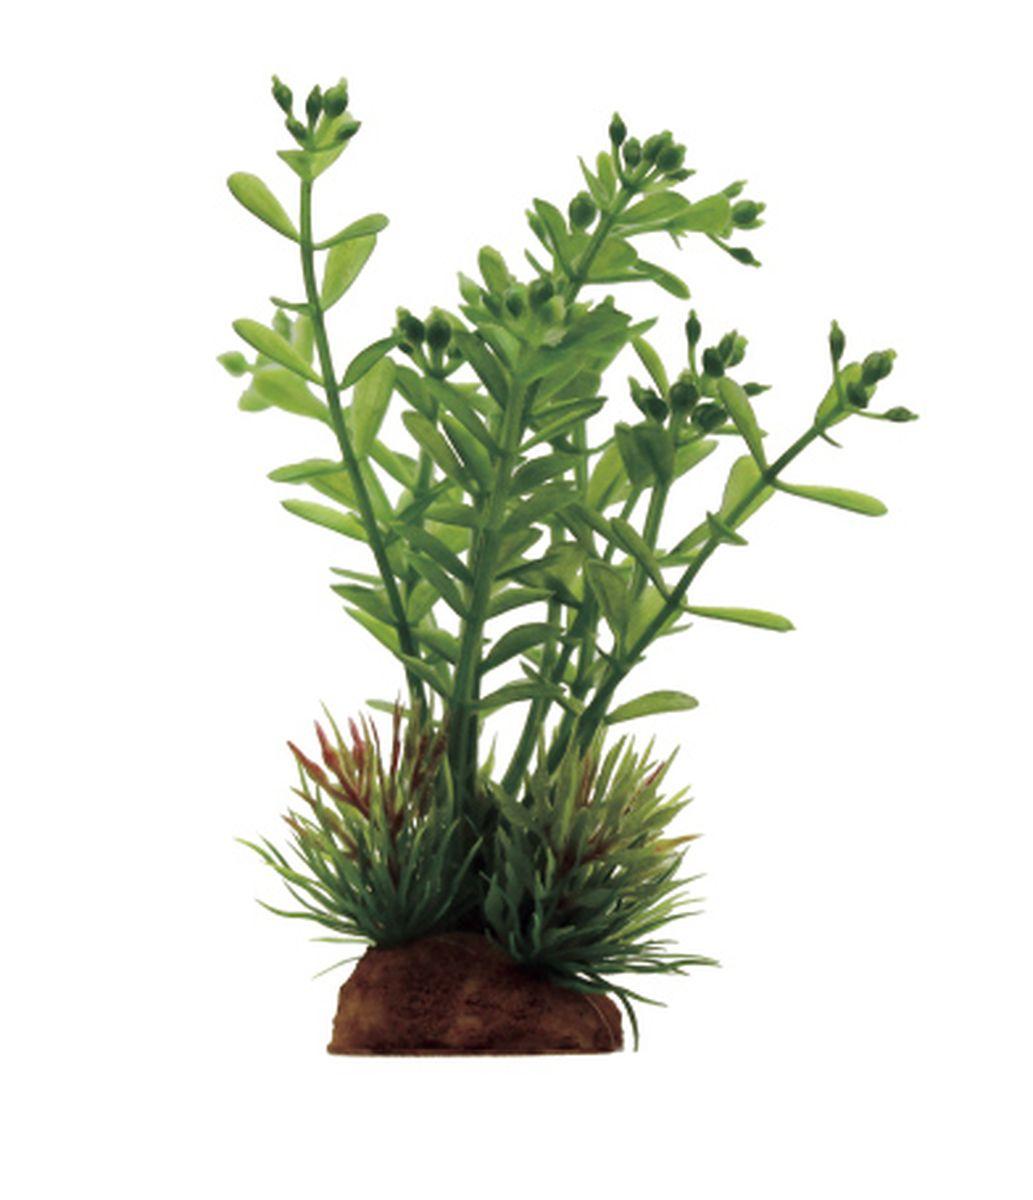 Композиция из растений для аквариума ArtUniq